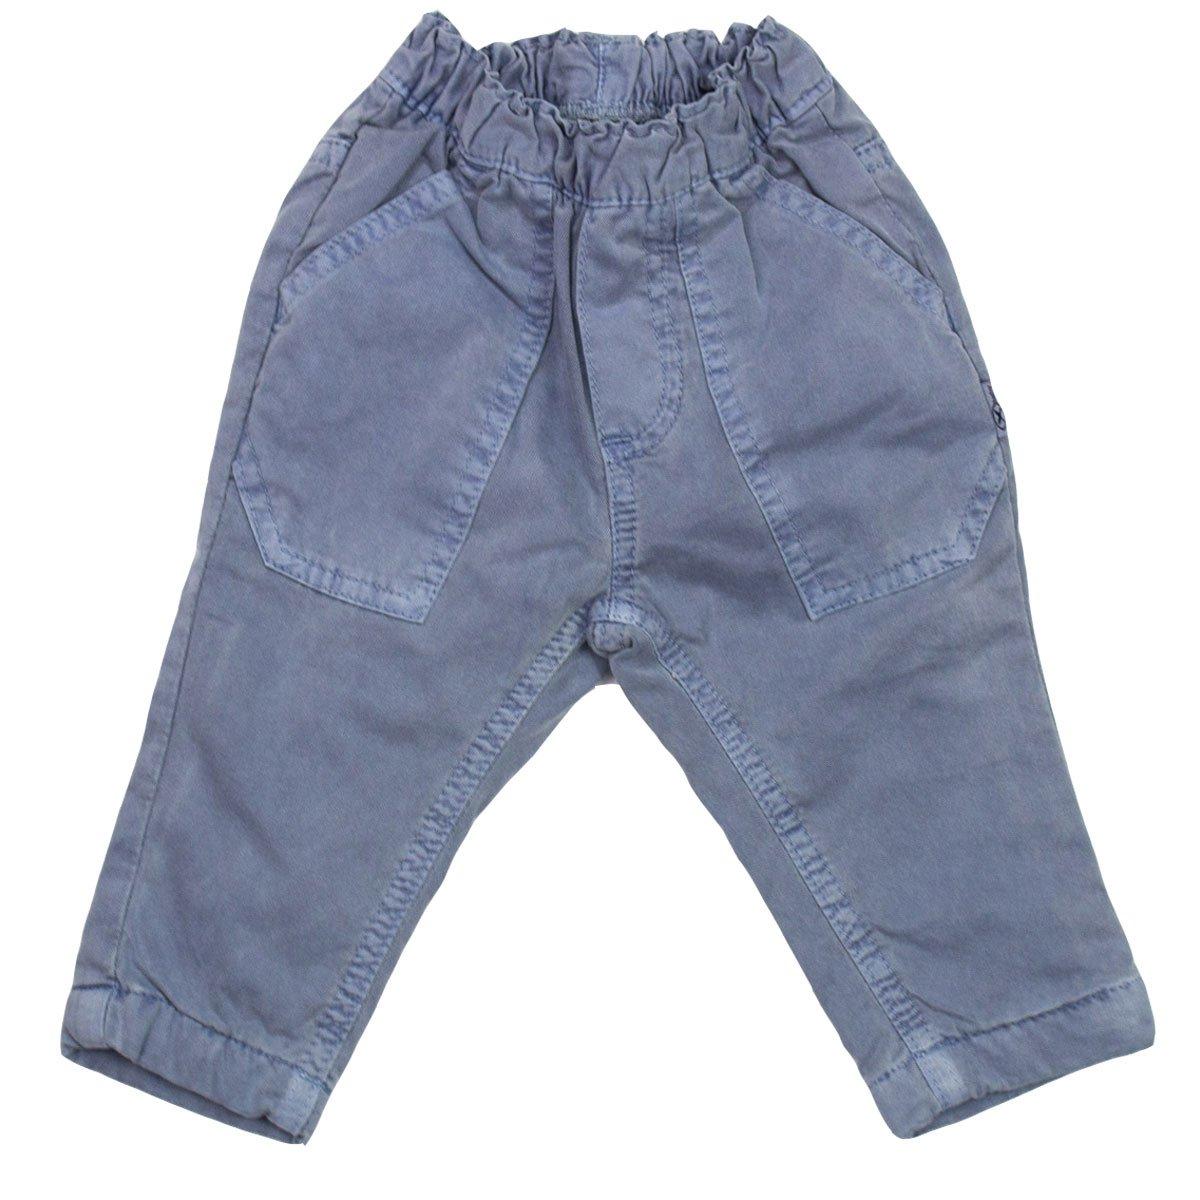 0d7d6b217 Bizz Store - Calça Jeans Infantil Bebê Hering Kids